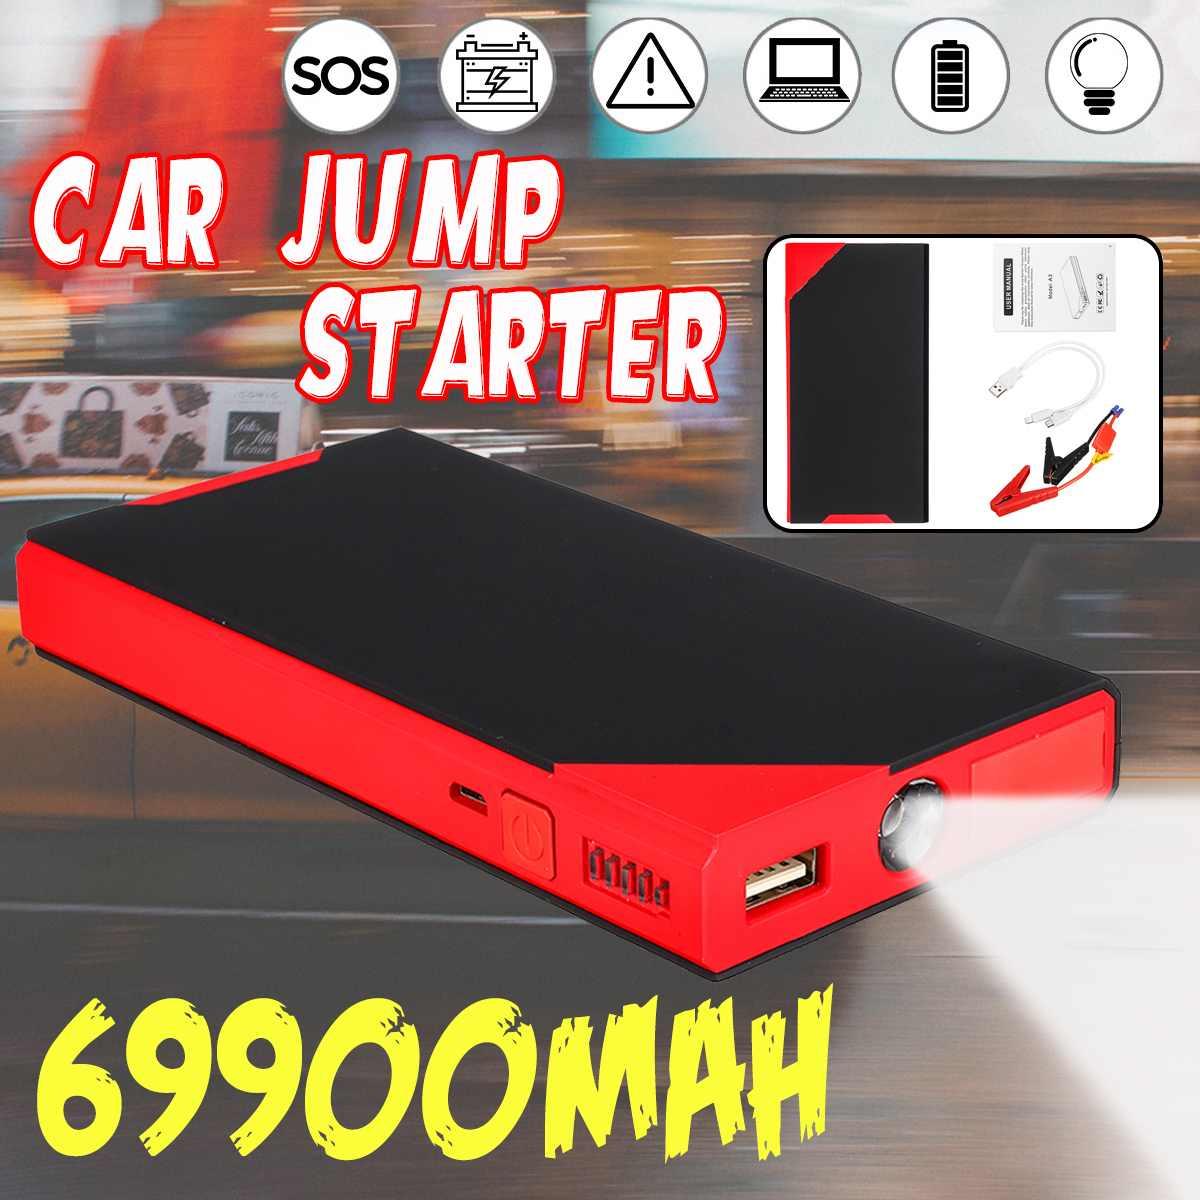 Multifunction 69900mAh Car Jump Starter Power Bank 12V USB LED Portable Emergency Car Battery Booster Charger Starting Device